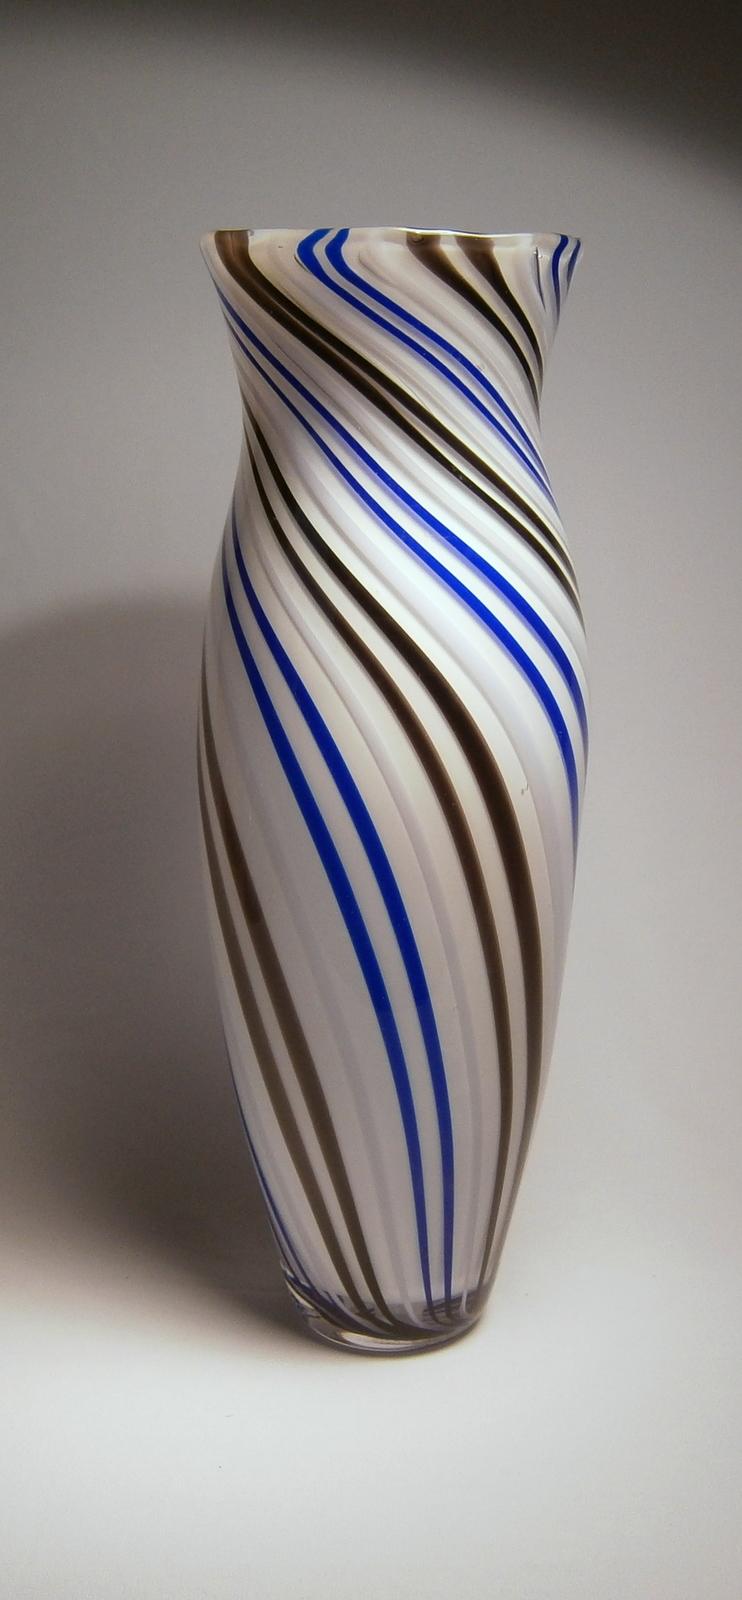 Striped Cane Vase (101)